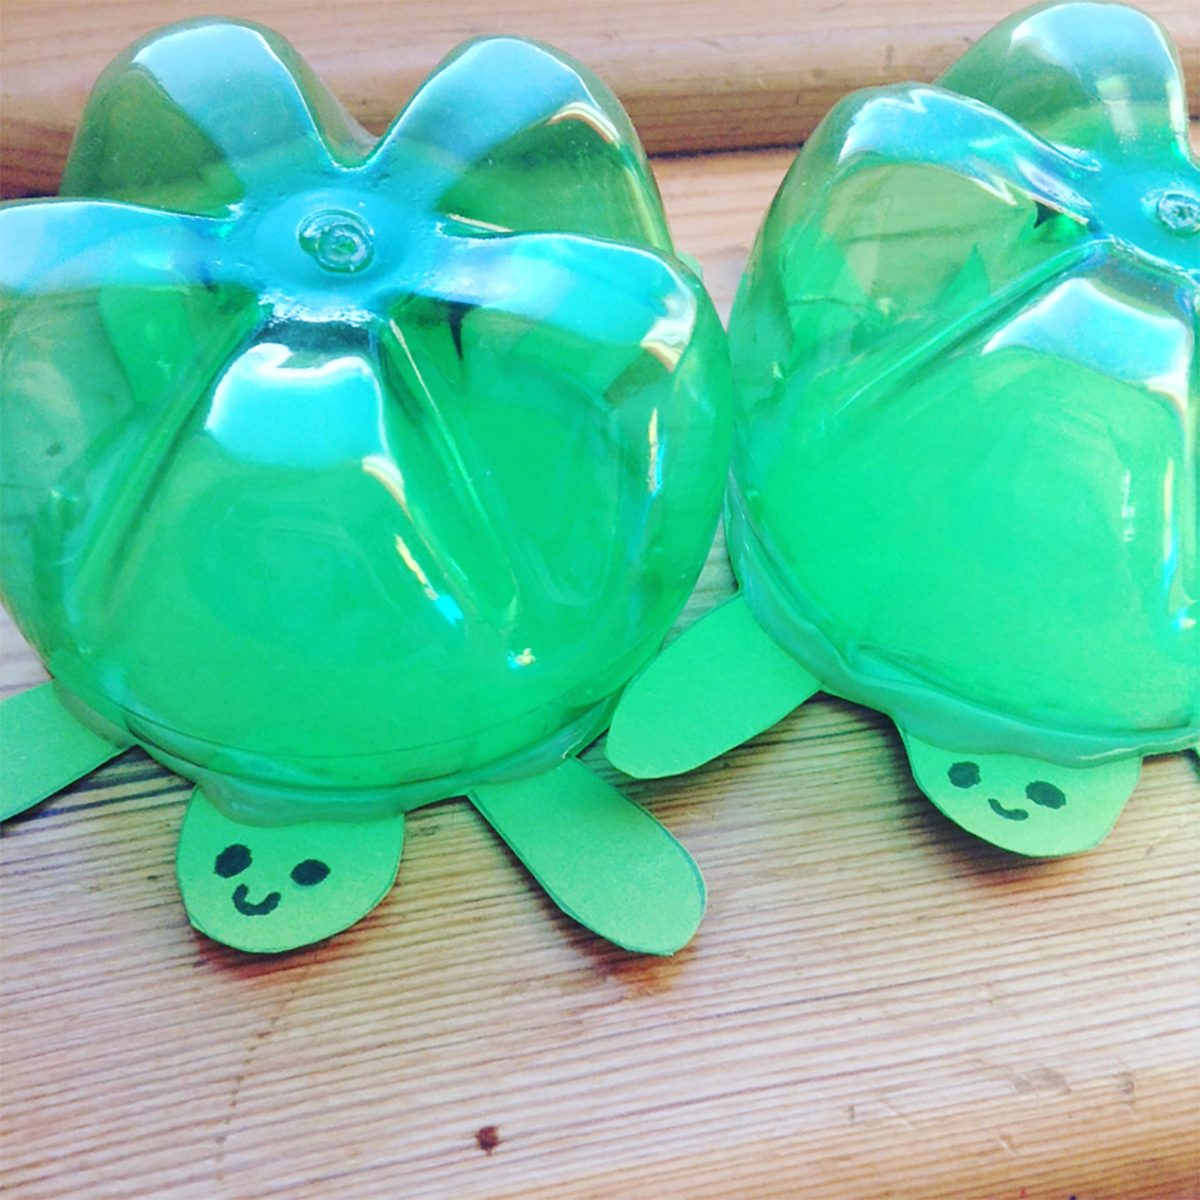 Soda bottle turtles